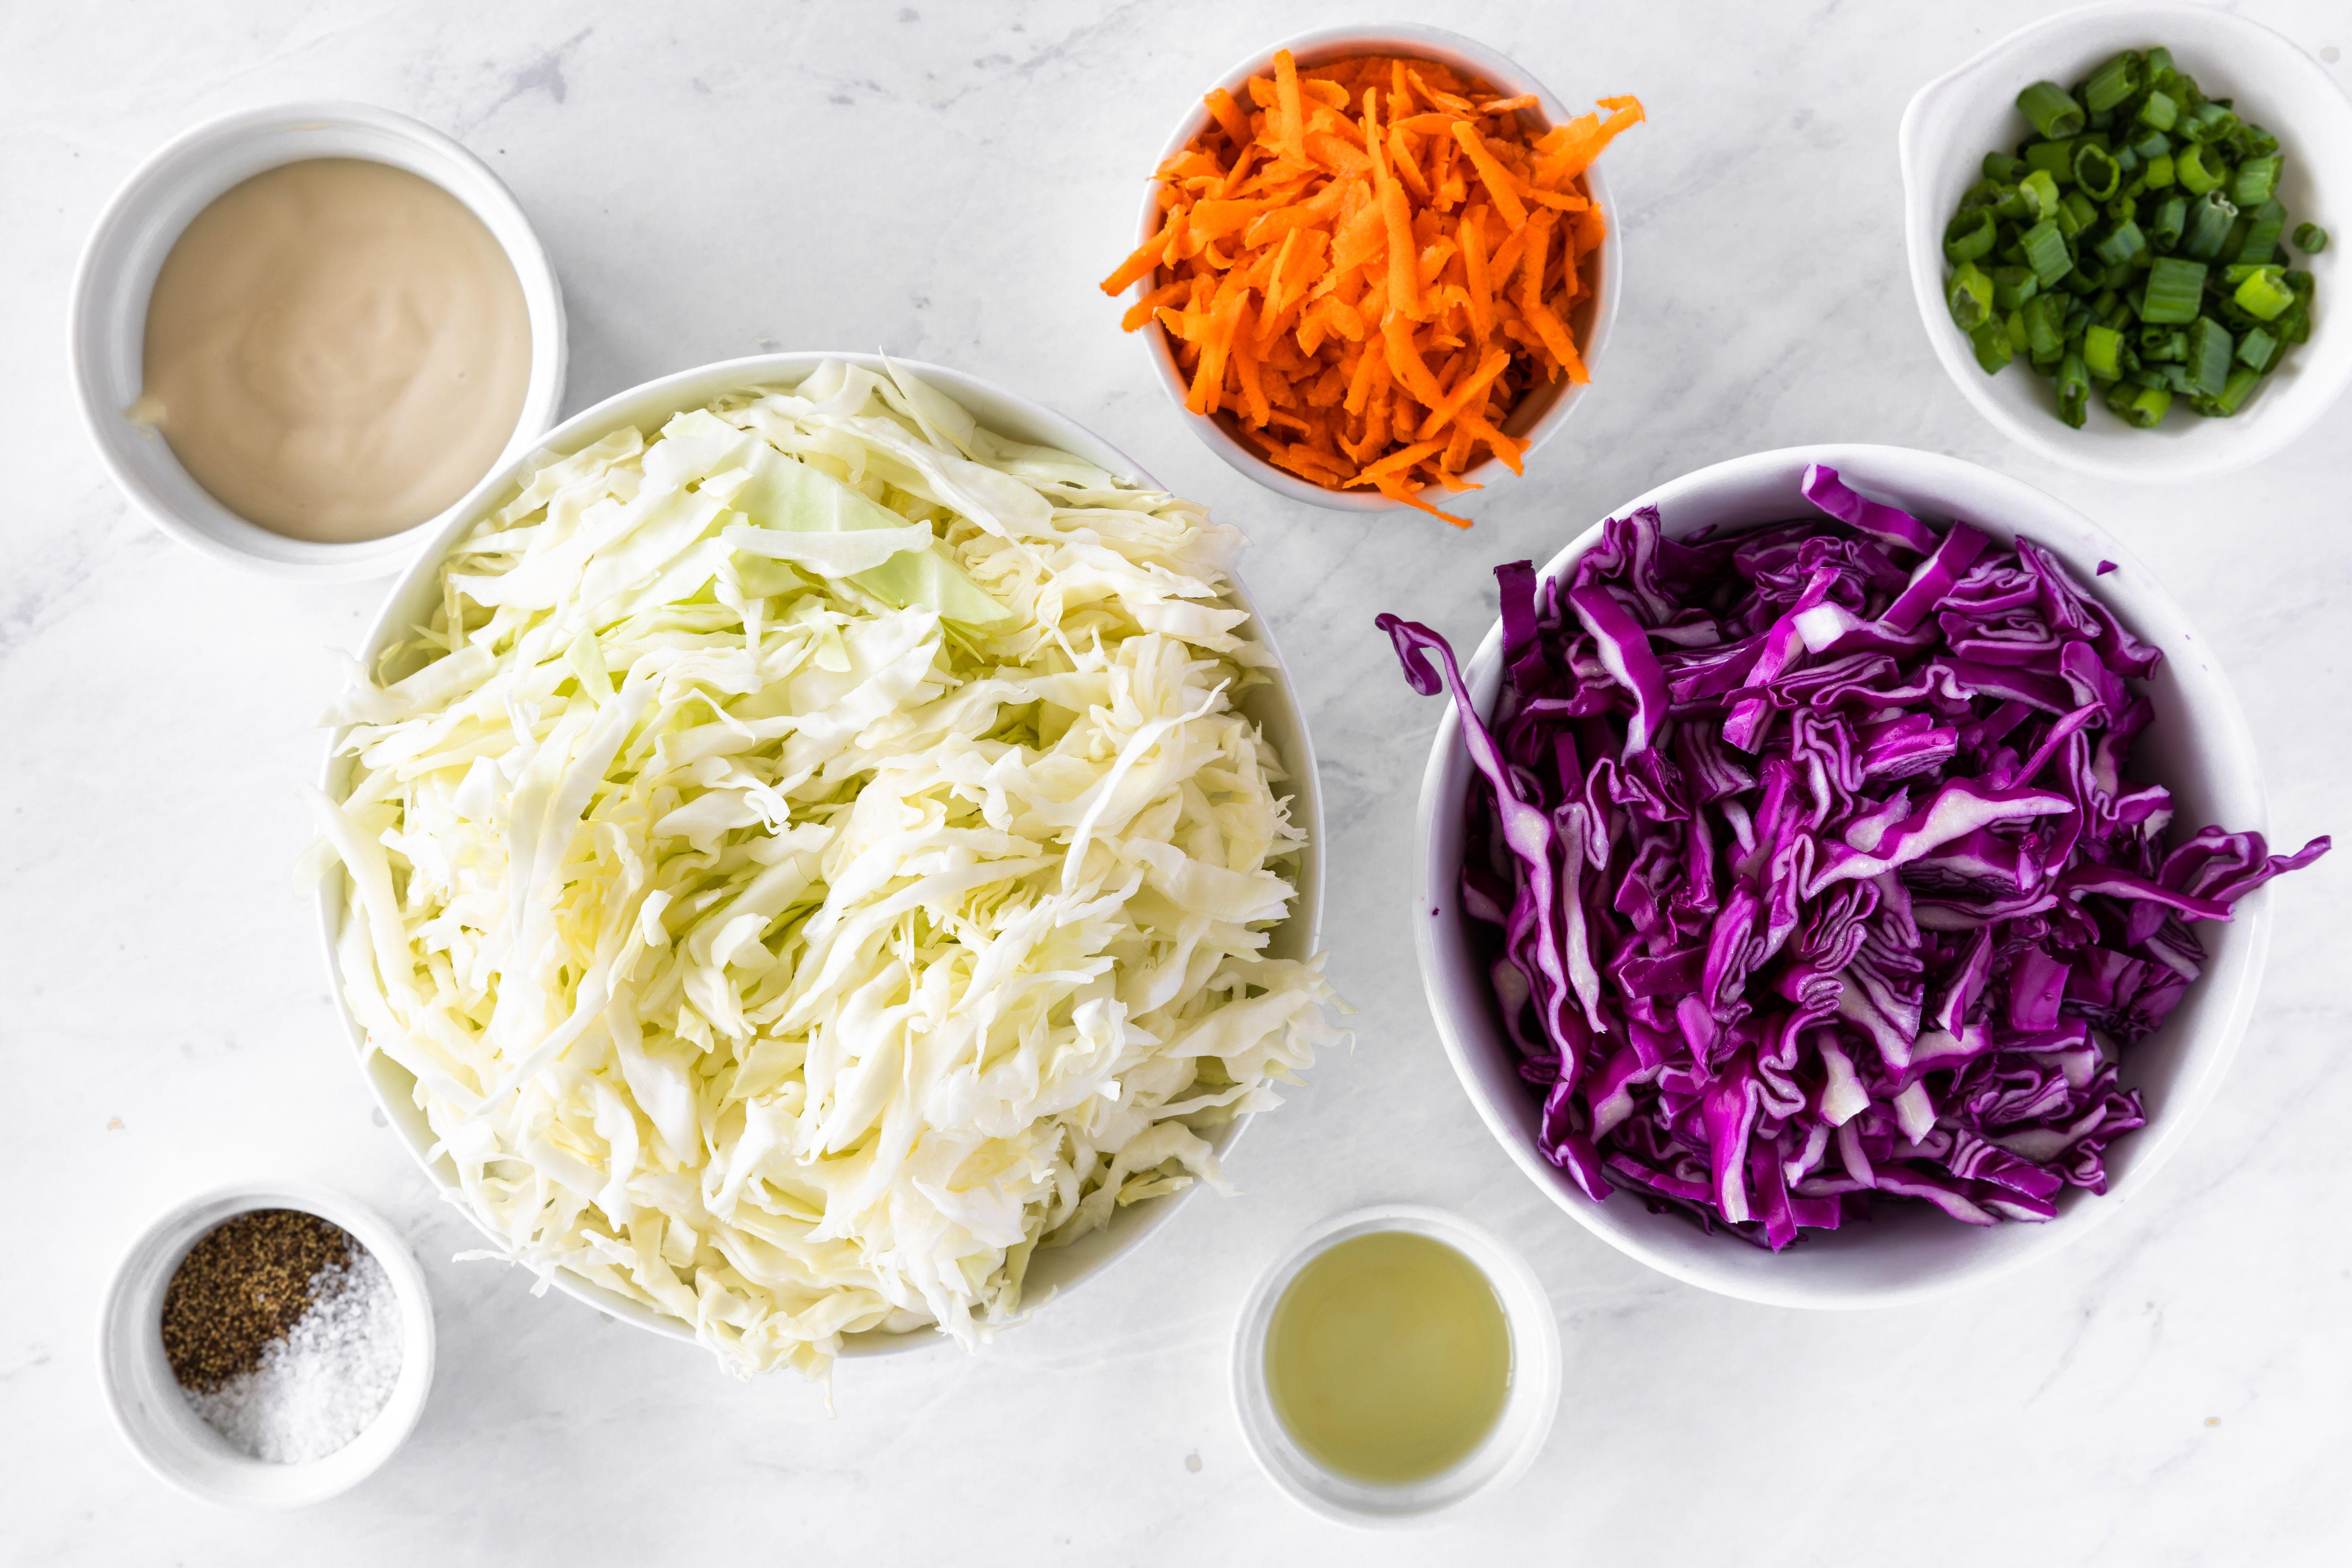 Ingredients for cole slaw salad